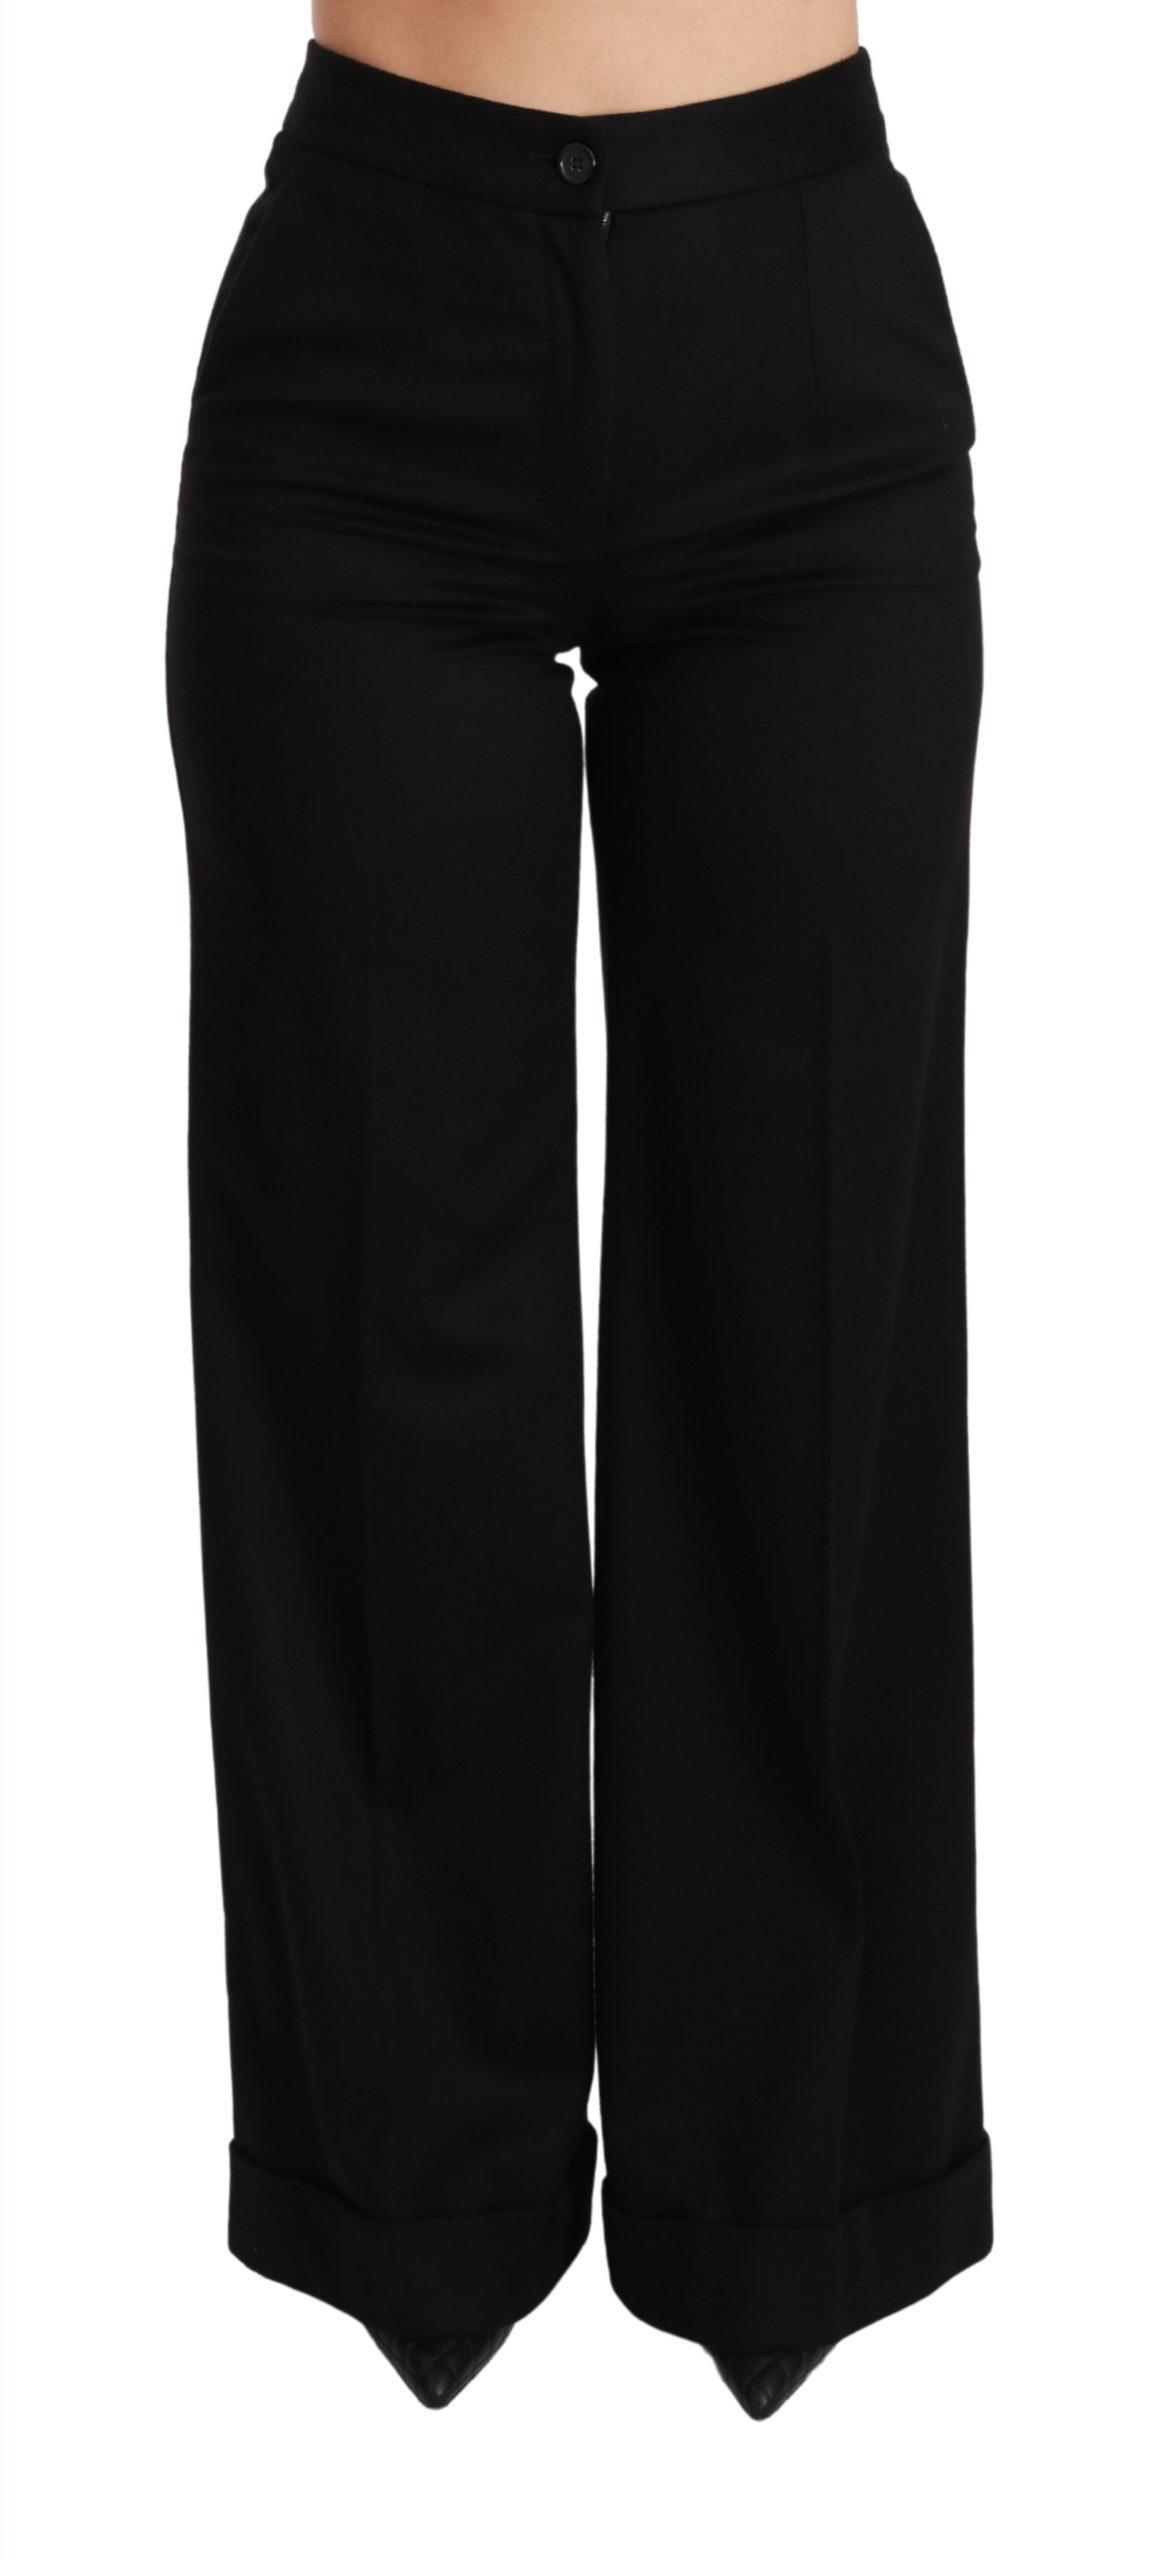 Black Wide Leg Flared Trouser Cashmere Pants - IT38|XS